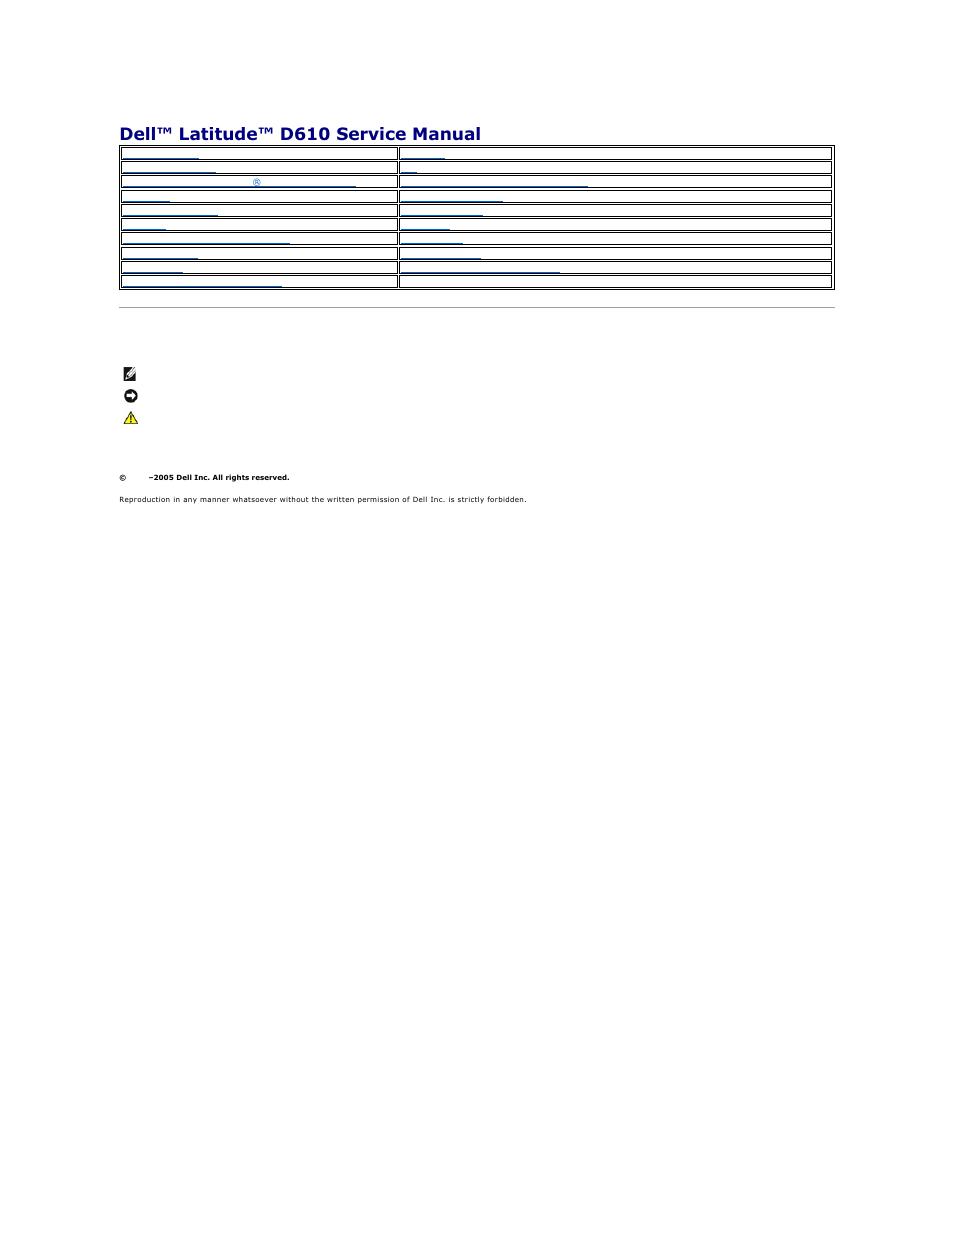 DELL LATITUDE D610 USER MANUAL PDF DOWNLOAD